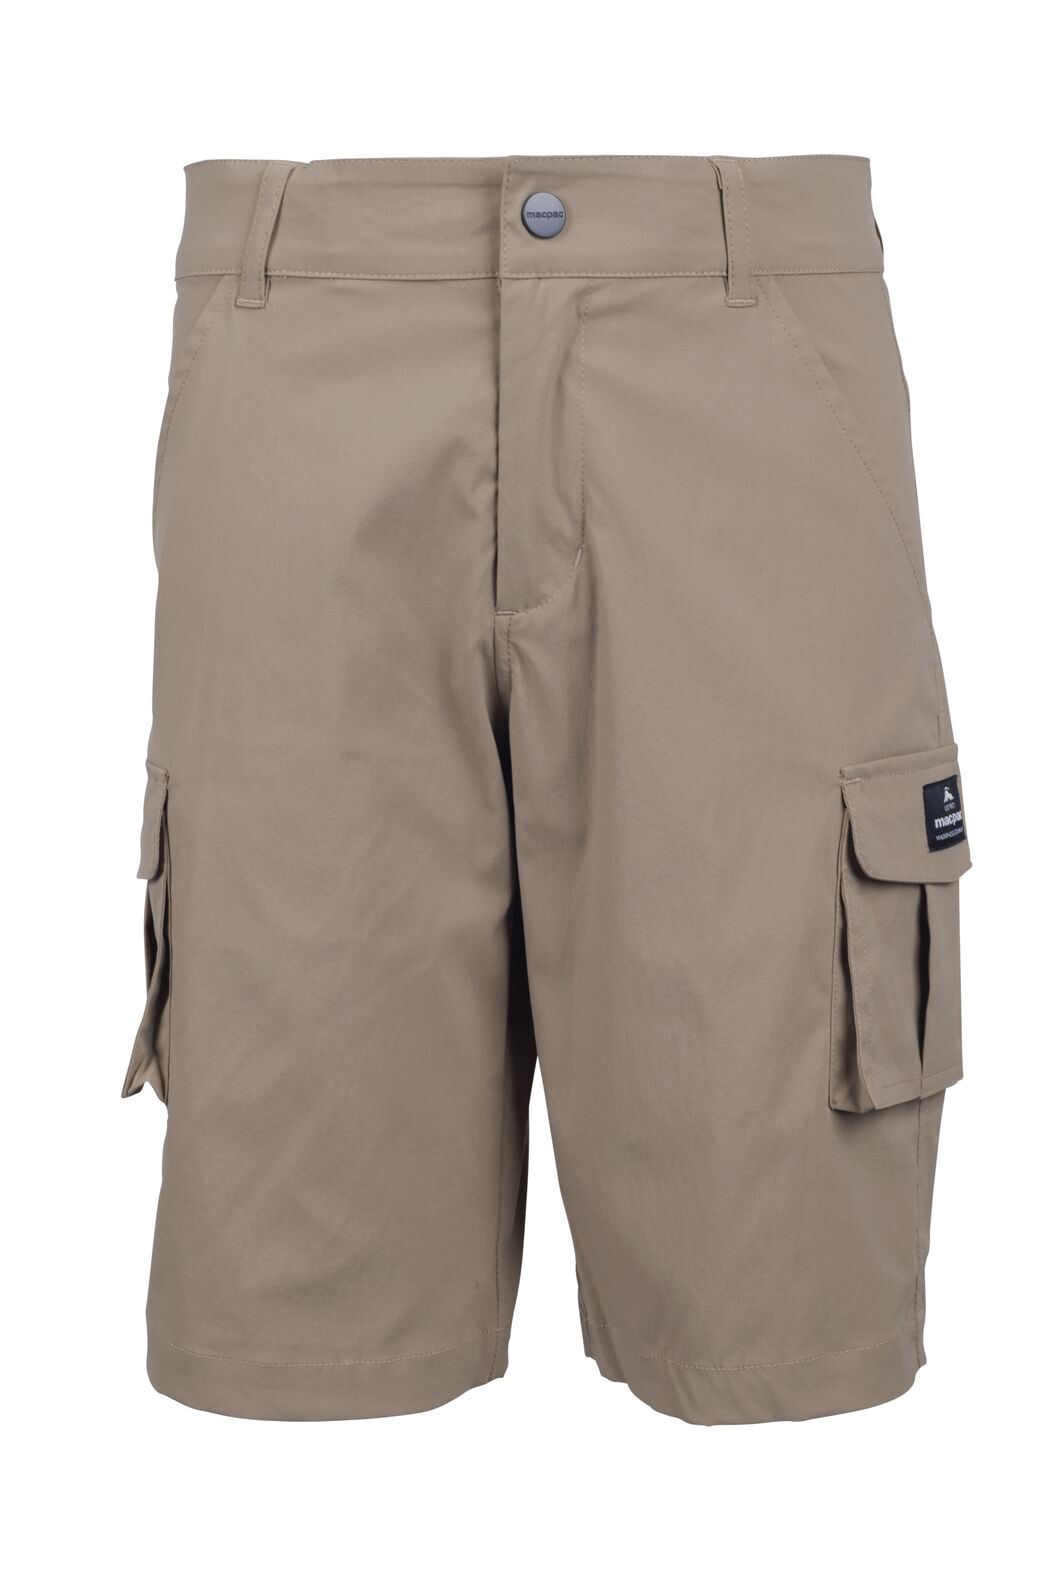 Macpac Lil Drifter Shorts - Kids', Lead Grey, hi-res